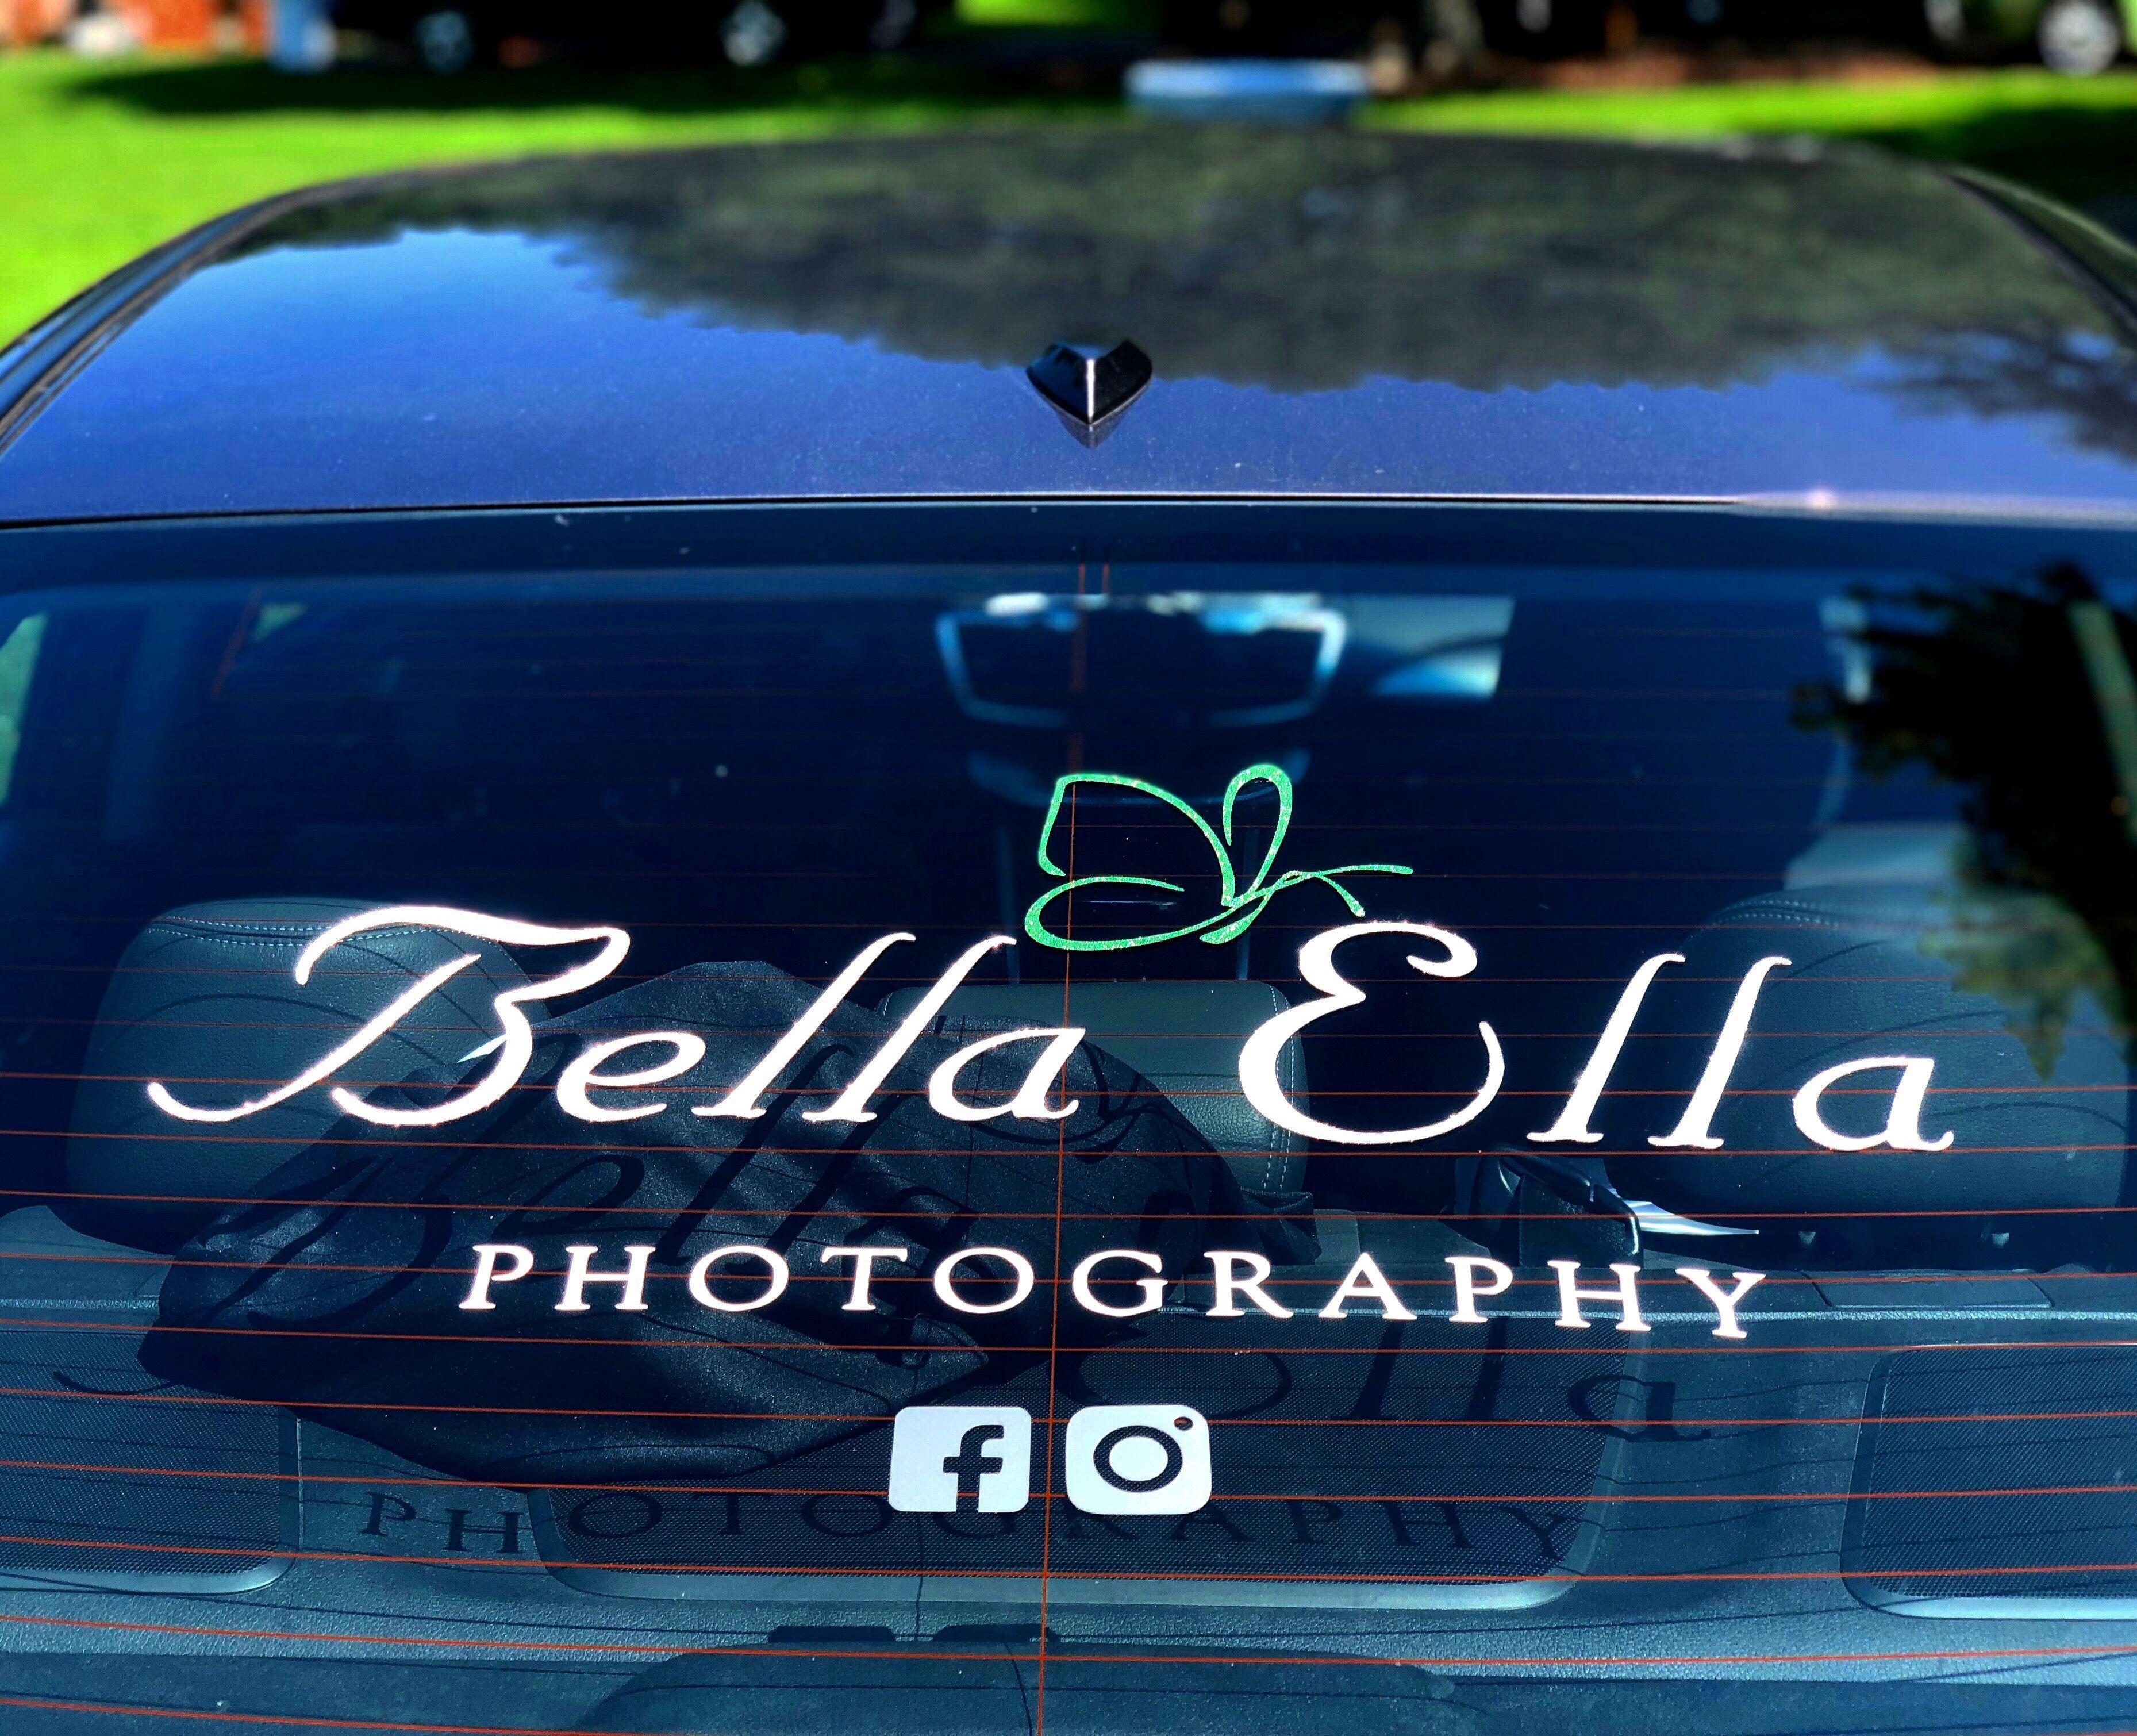 Car rear window business organization promote decal custom